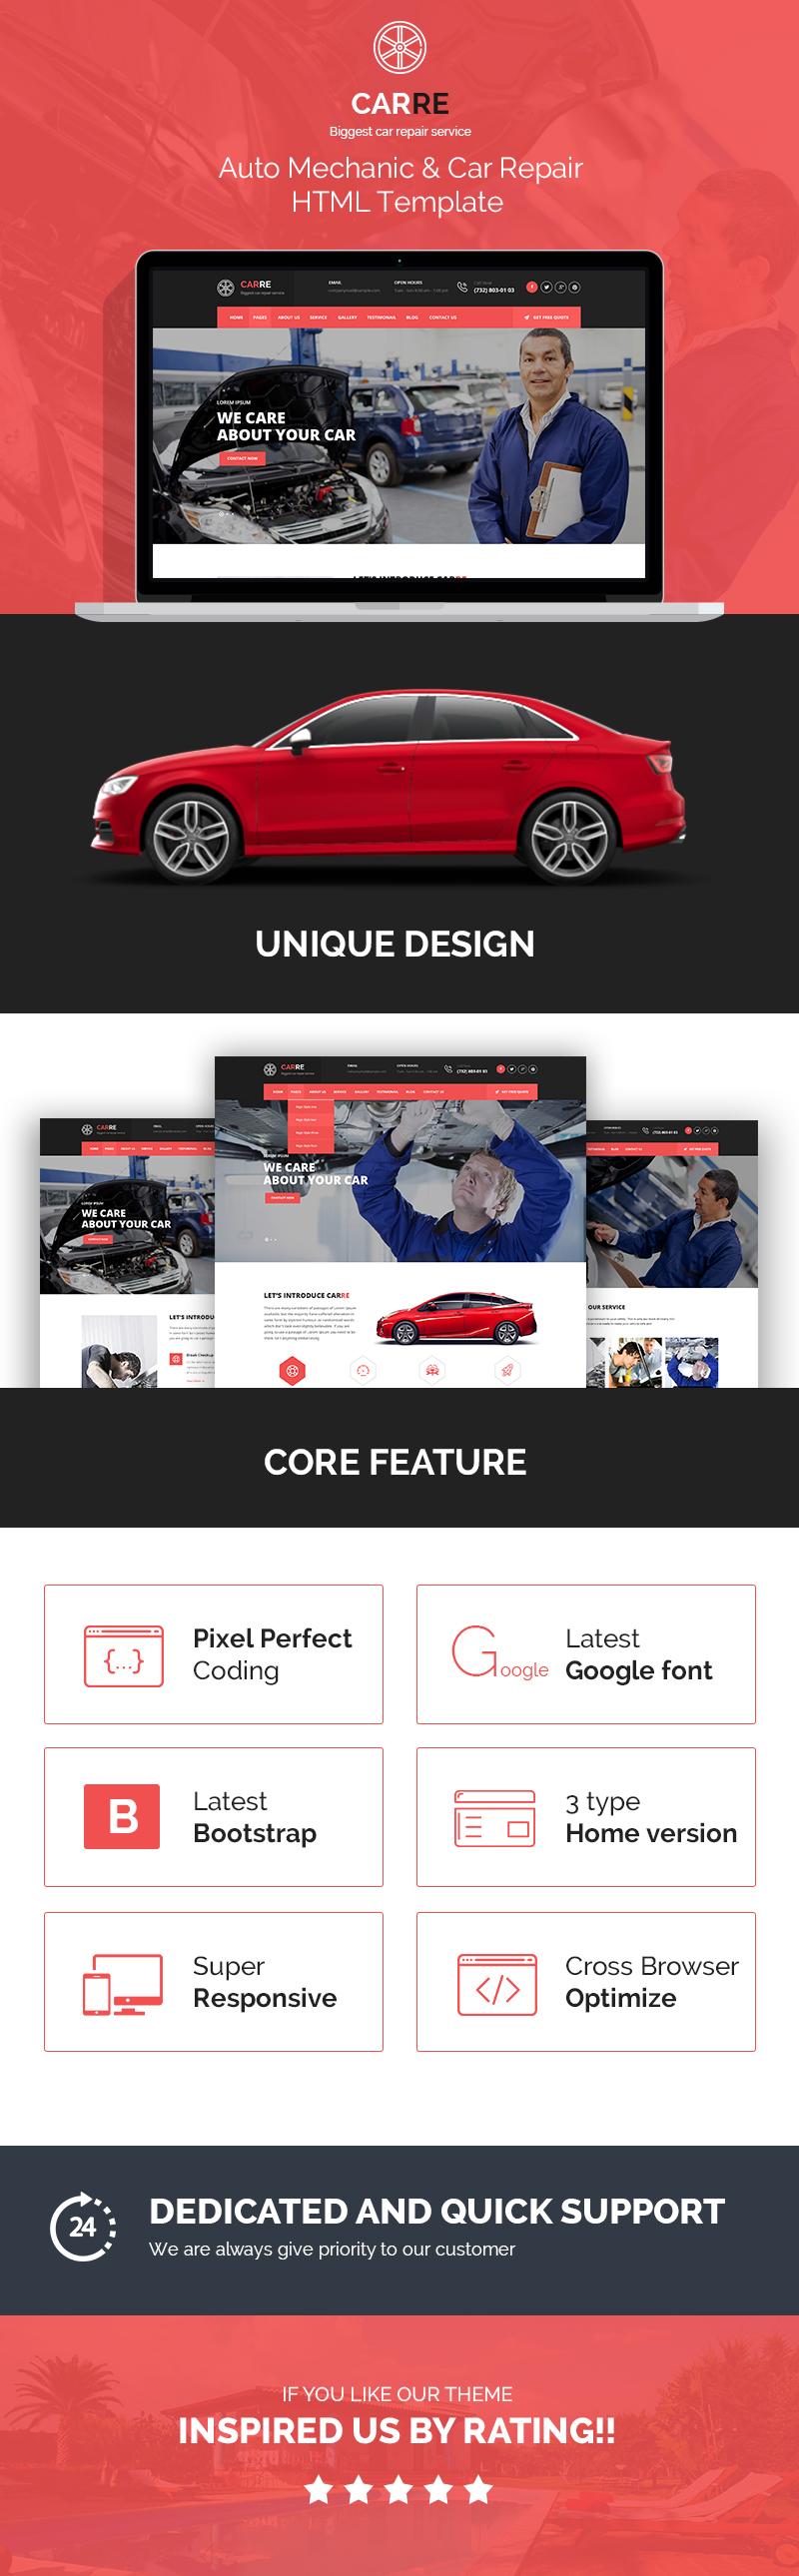 Car RE - Auto Mechanic & Car Repair HTML Template - 2